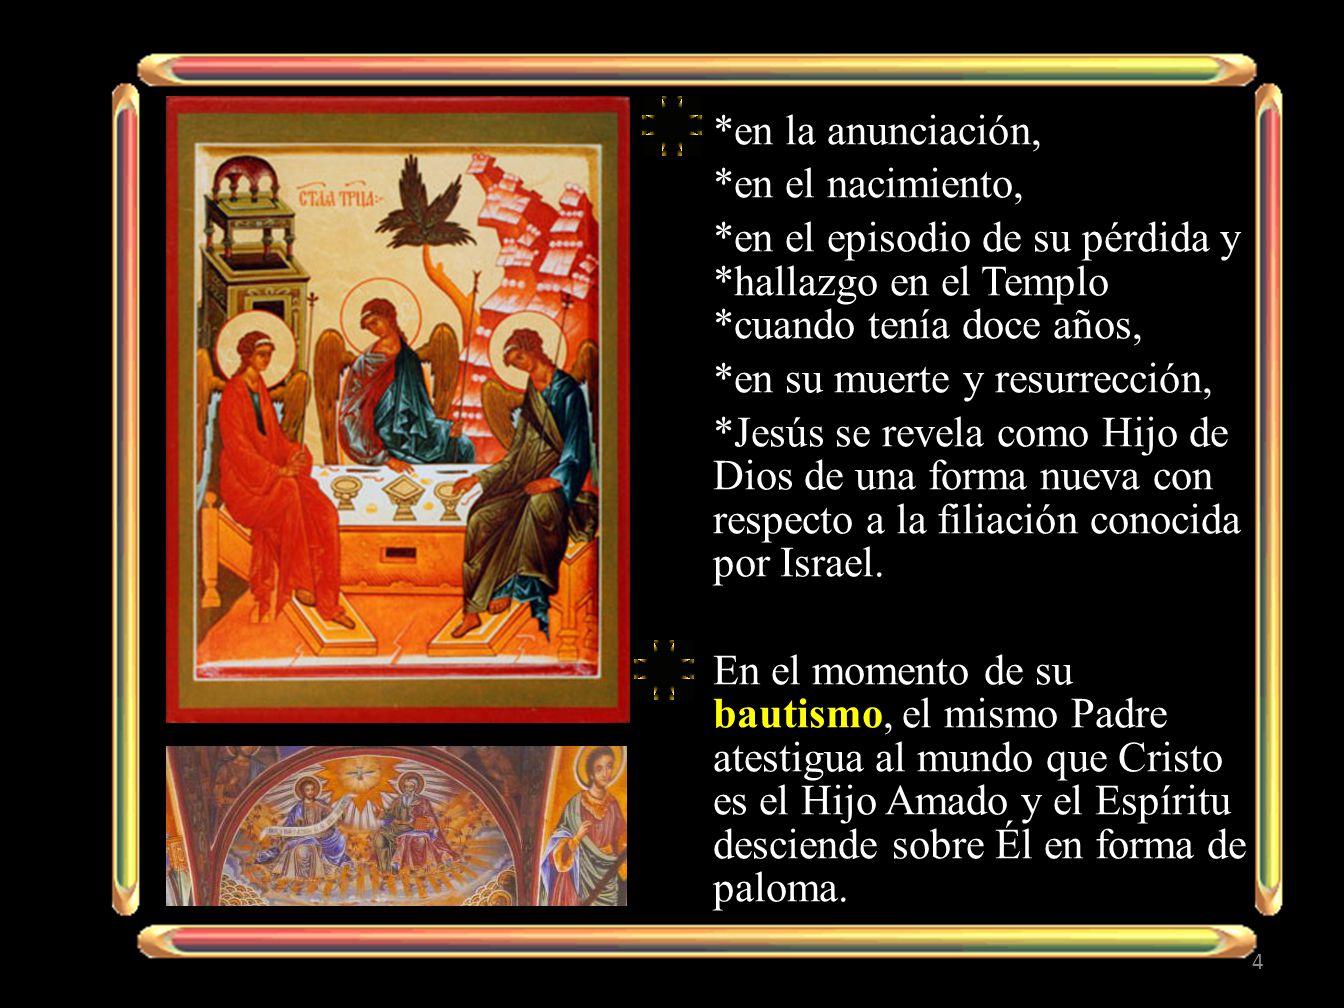 www.institutodeteologia.org www.oracionesydevociones.info www.encuentra.com juanmariagallardo@gmail.com secretariaifti@gmail.com 35